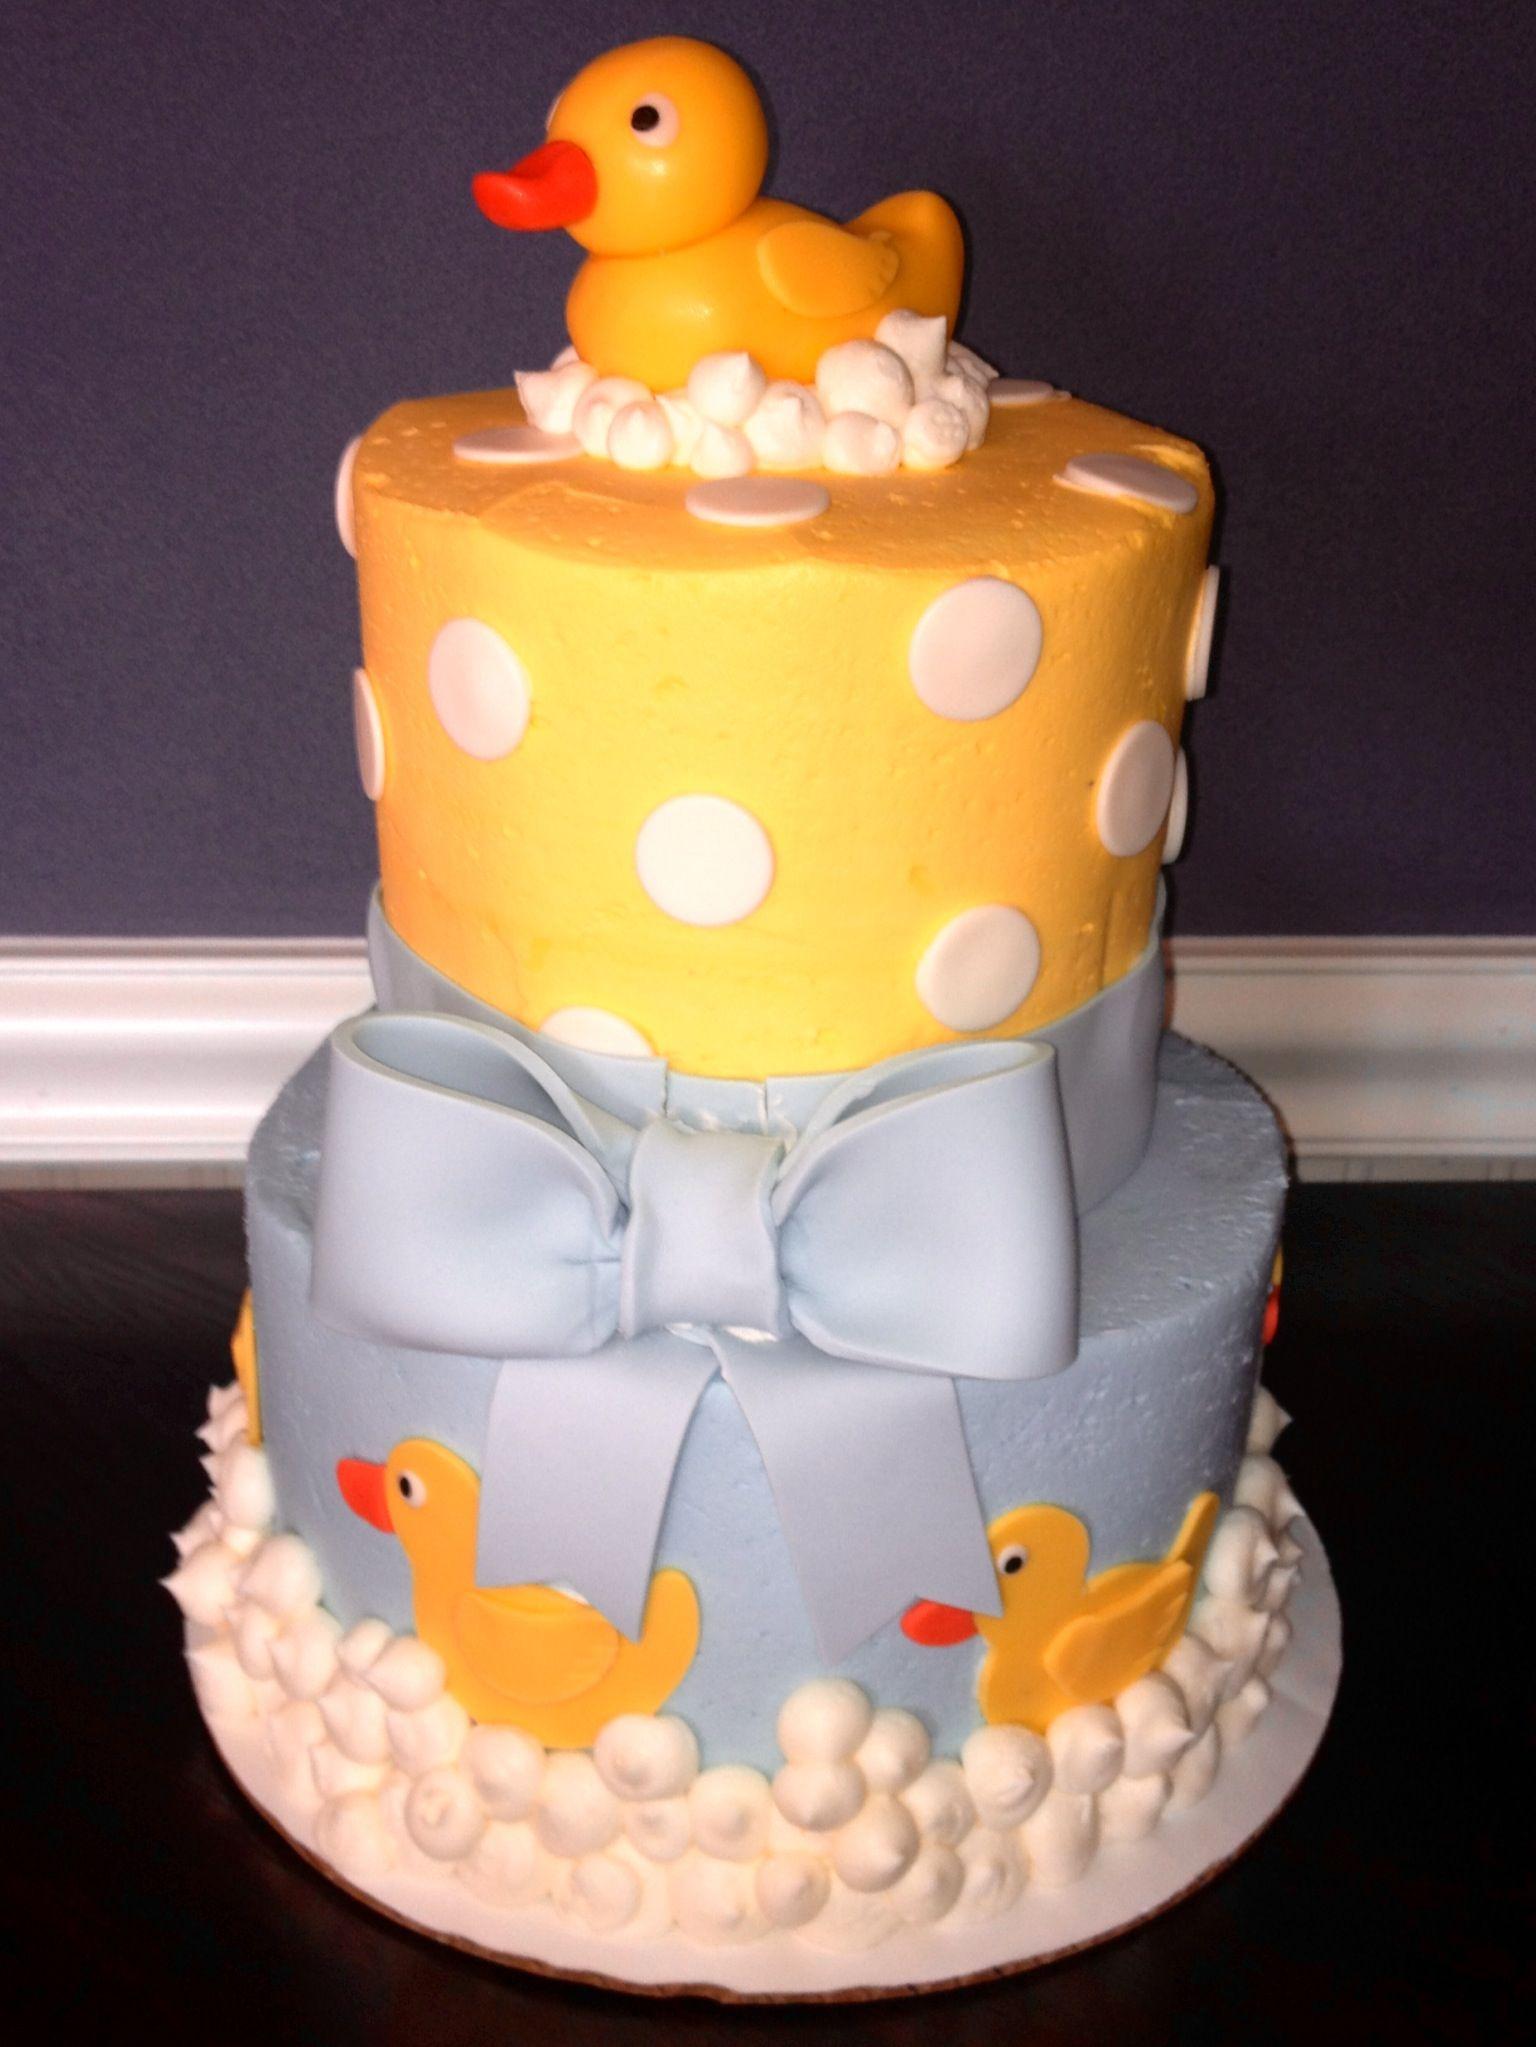 Rubber ducky baby shower cake Baby Shower Pinterest